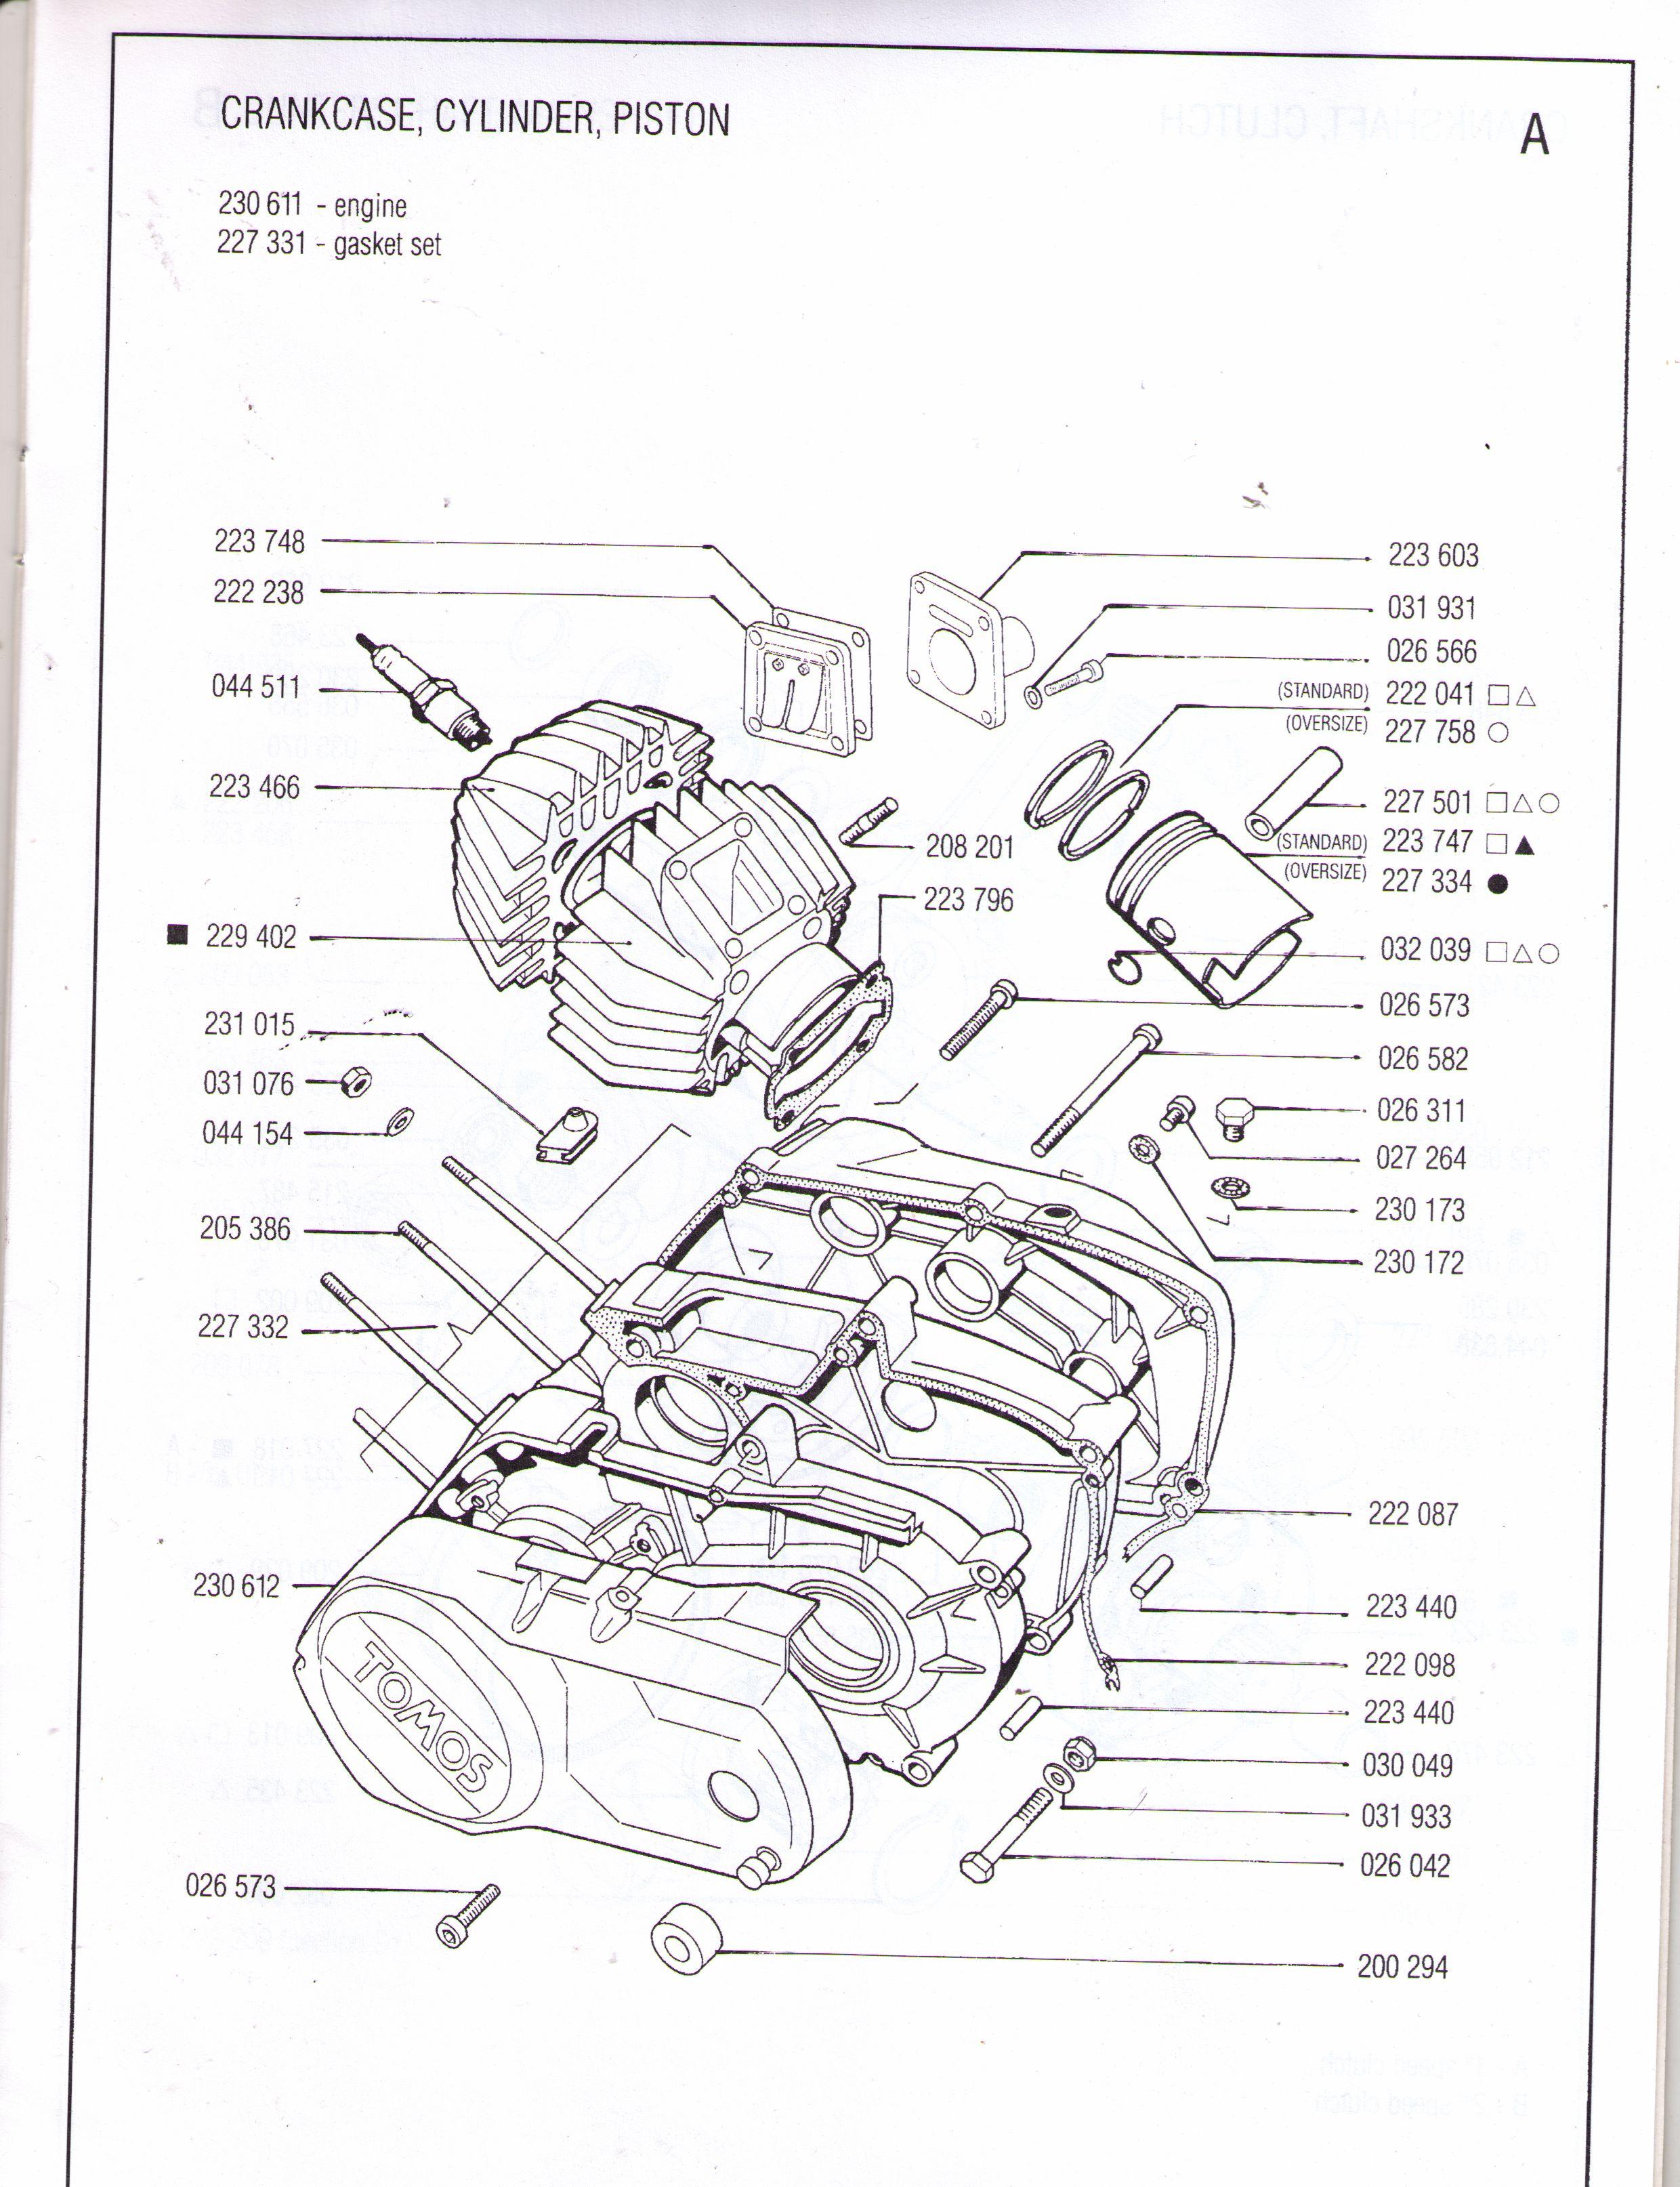 diagrammer pdf